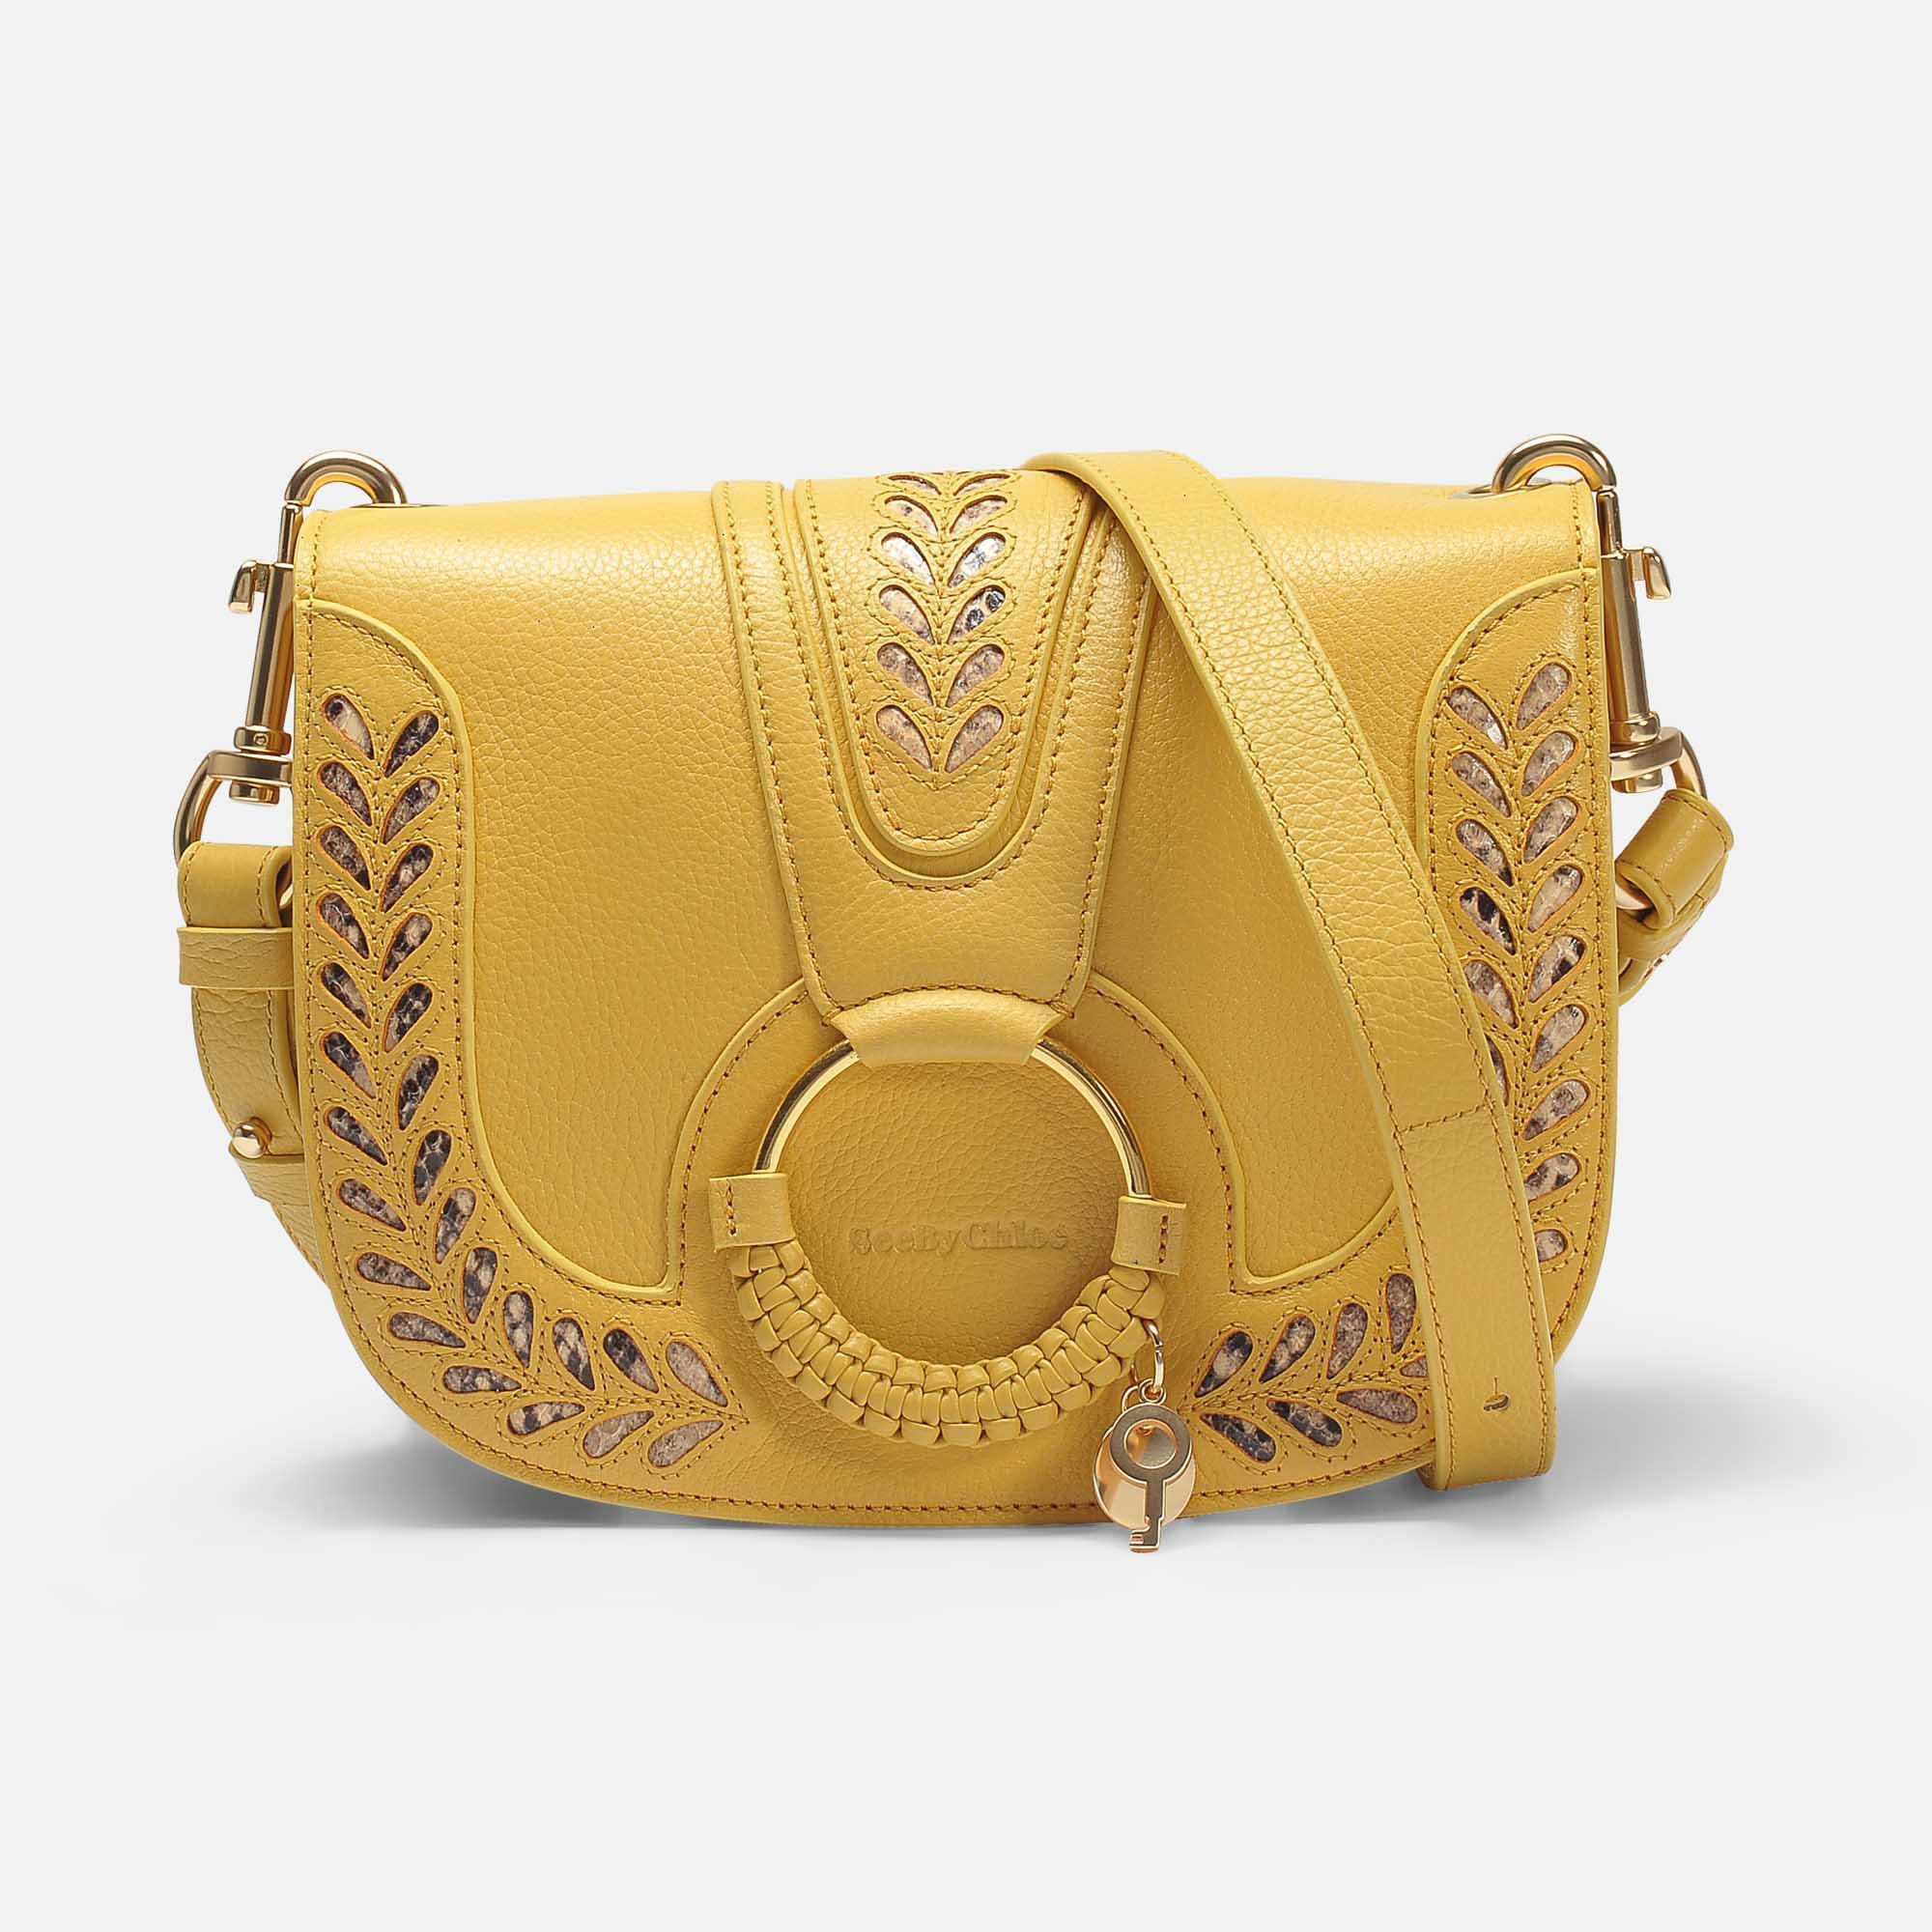 f972f6440 See By Chloé Hana Small Crossbody Bag in Yellow - Lyst